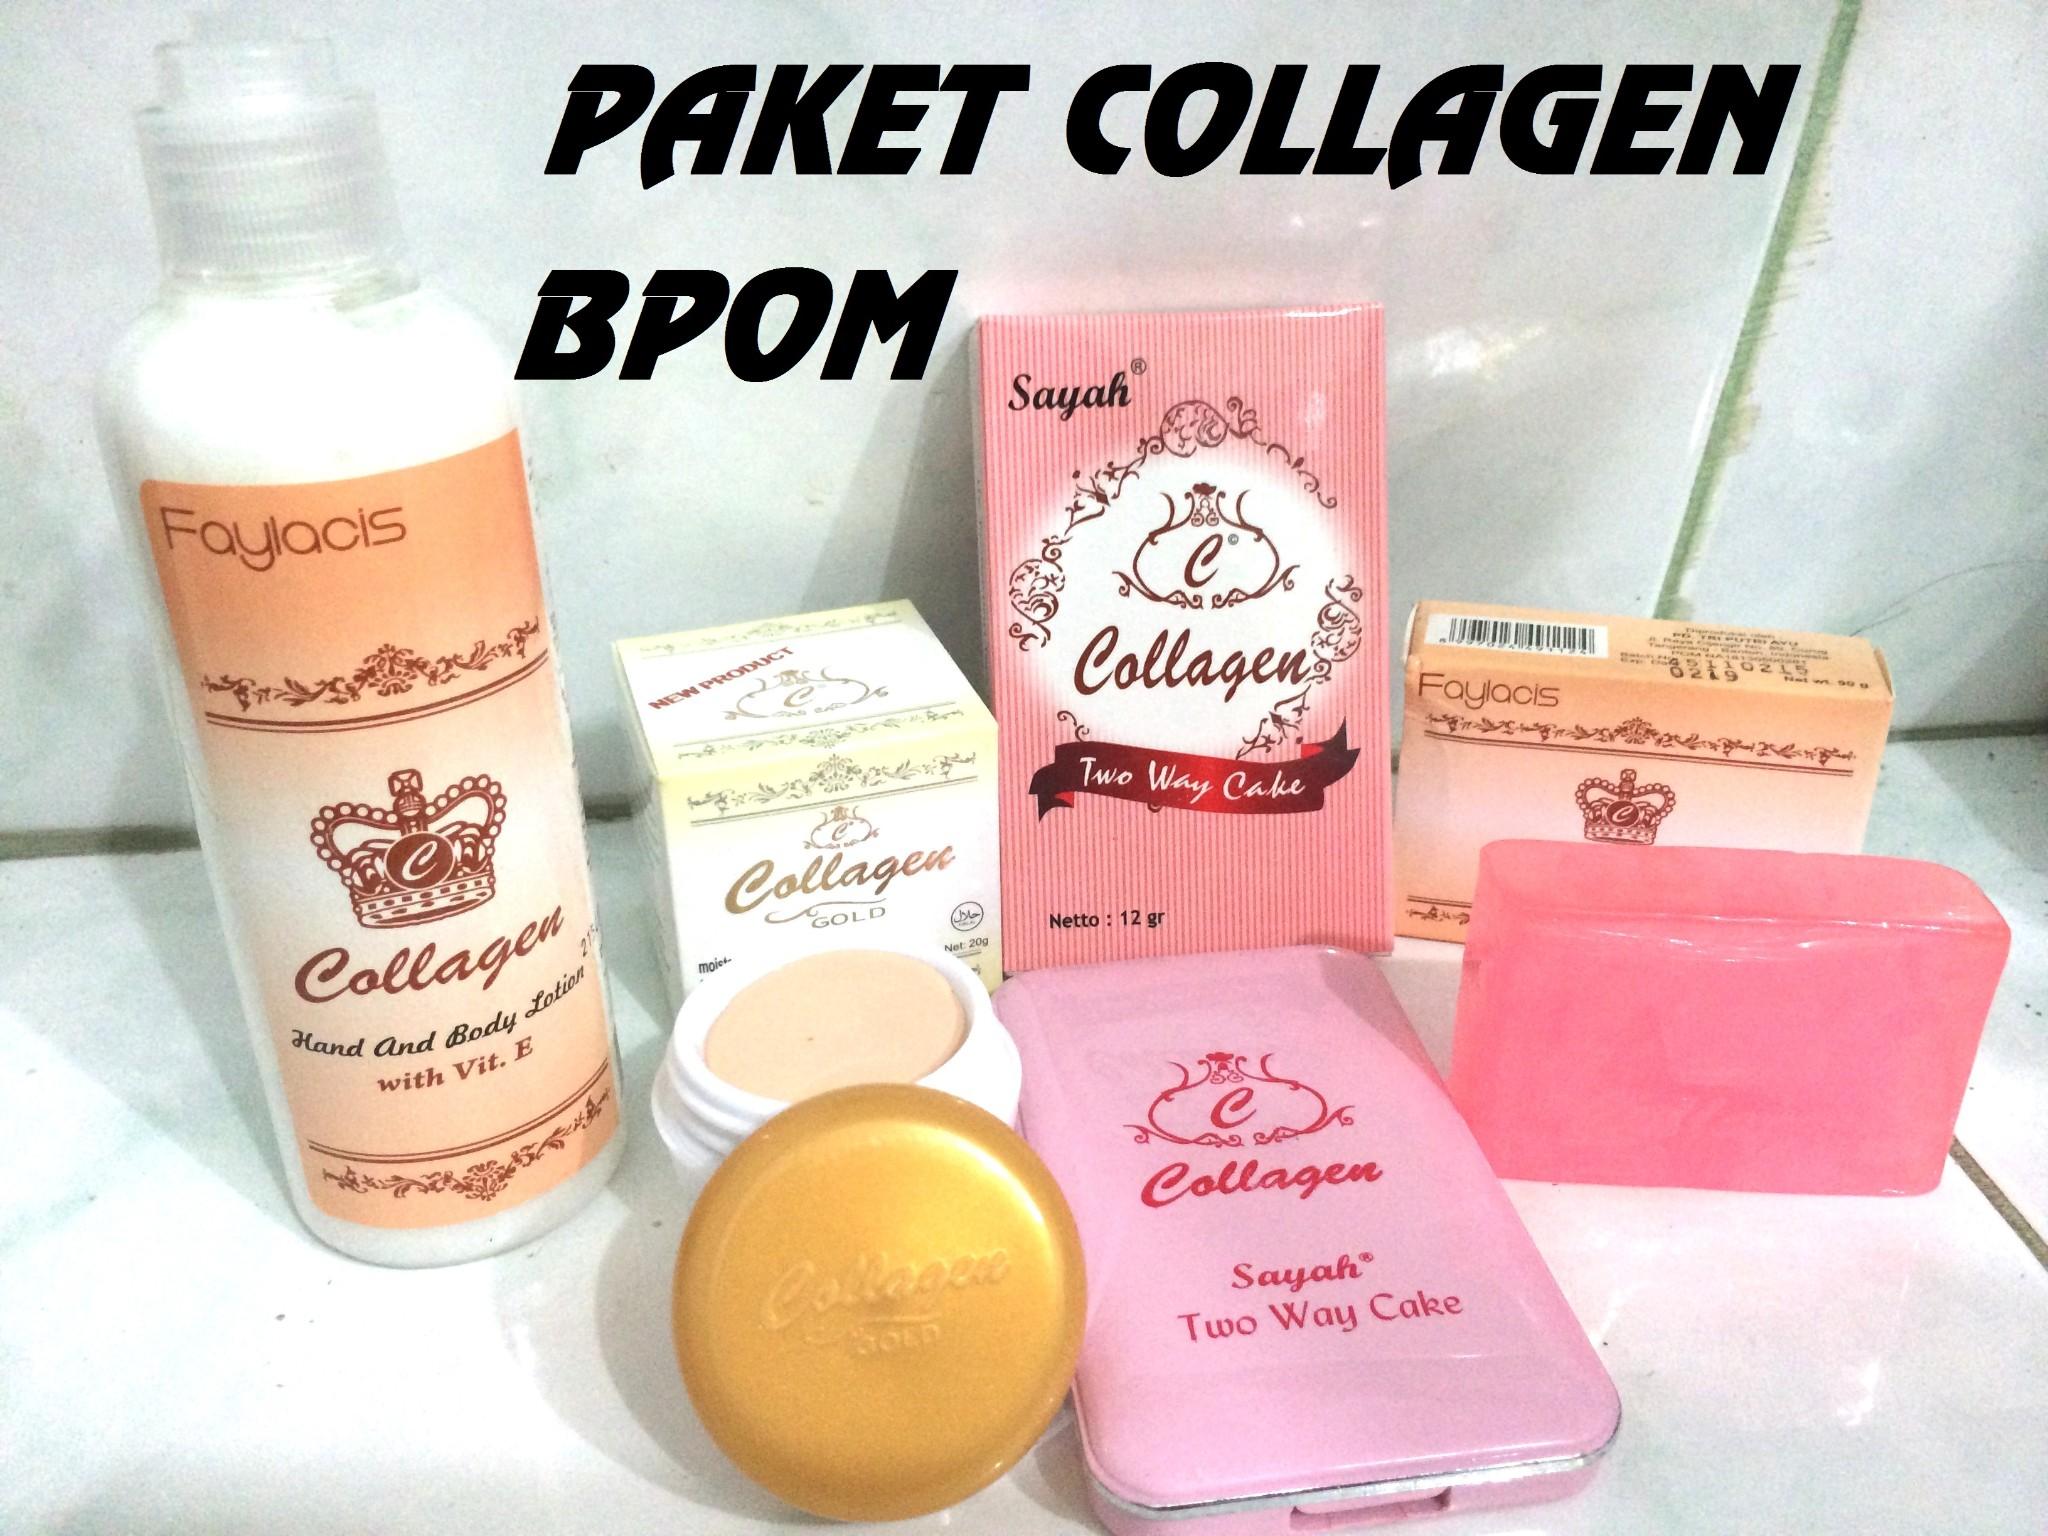 Collagen Plus Vit E Whitening Day Night Bpom Detikforum Cream Siang Dan Malam Click Here To See A Large Version